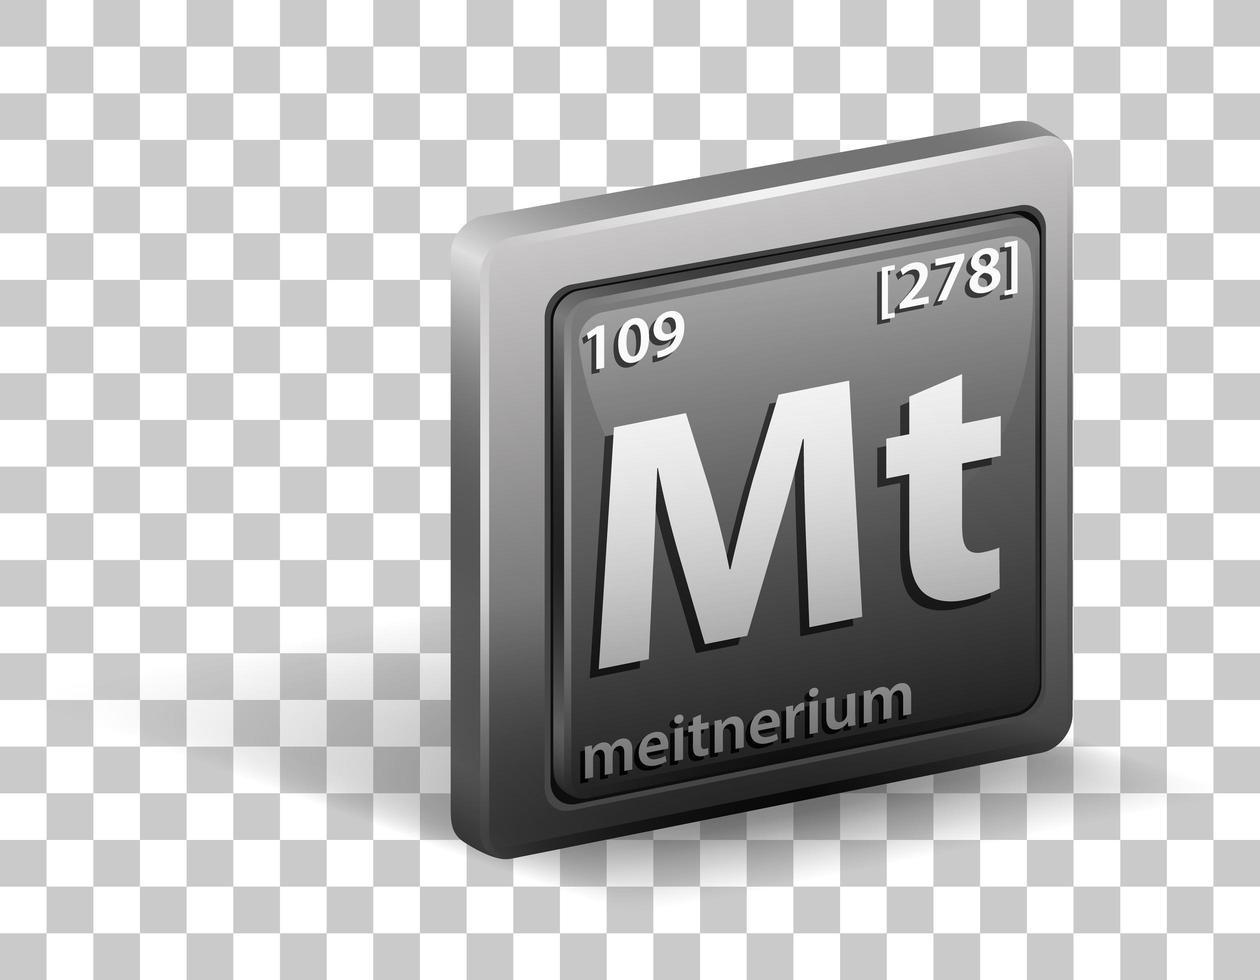 meitnerium scheikundig element. chemisch symbool met atoomnummer en atoommassa. vector